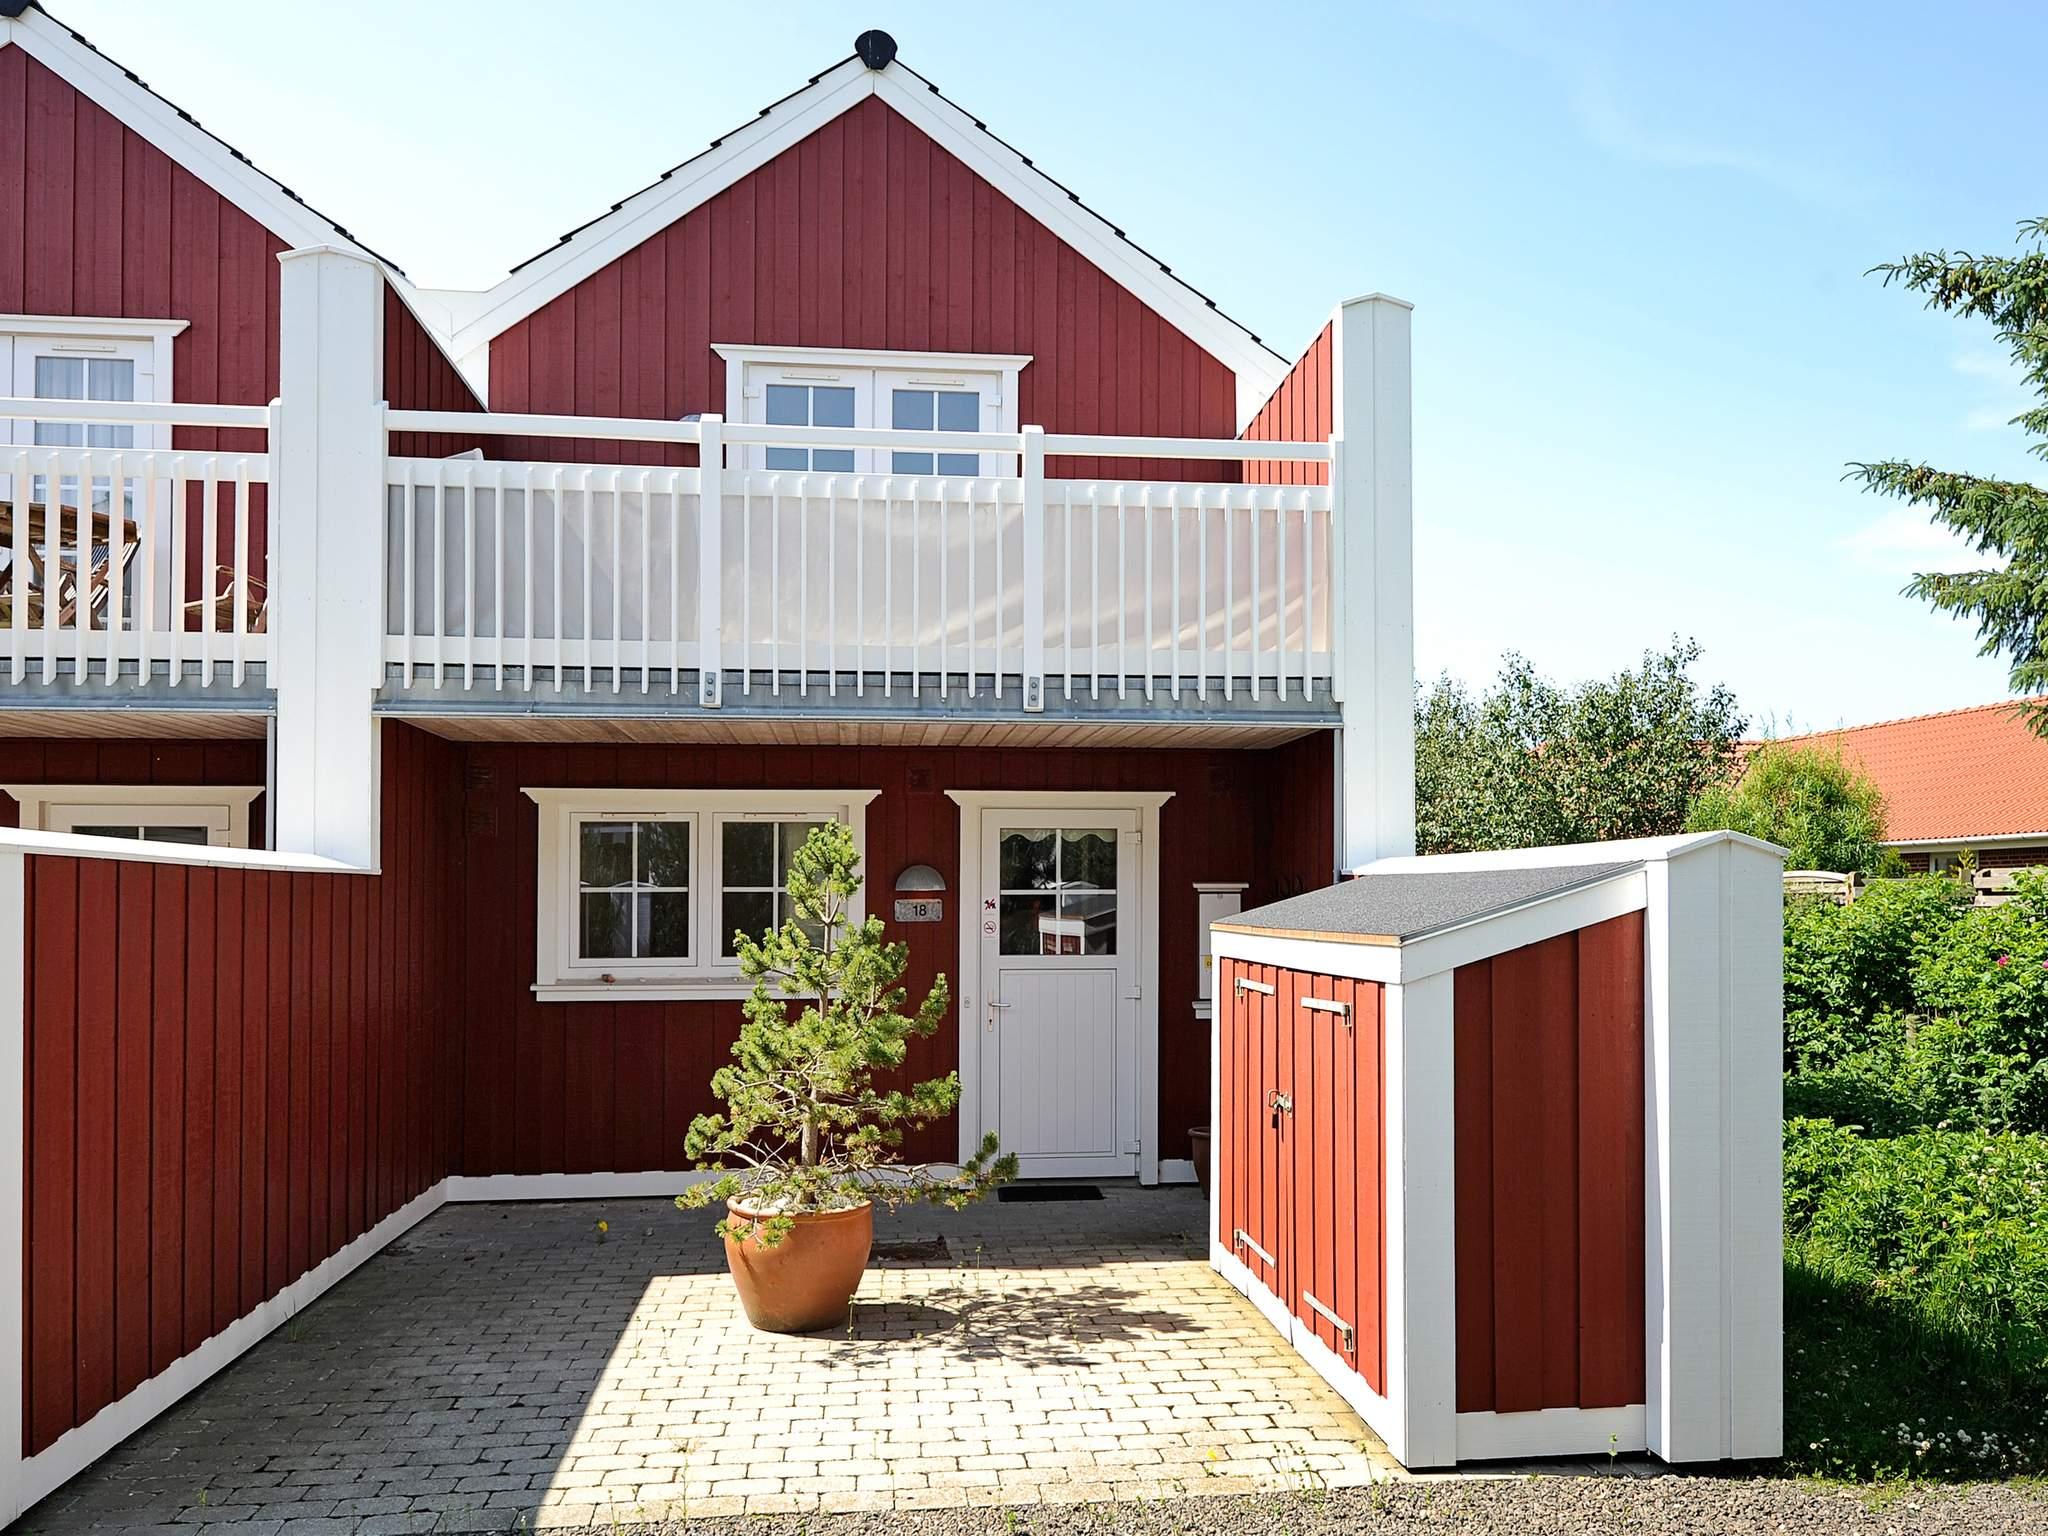 Ferienhaus Blåvand (226304), Blåvand, , Westjütland, Dänemark, Bild 20